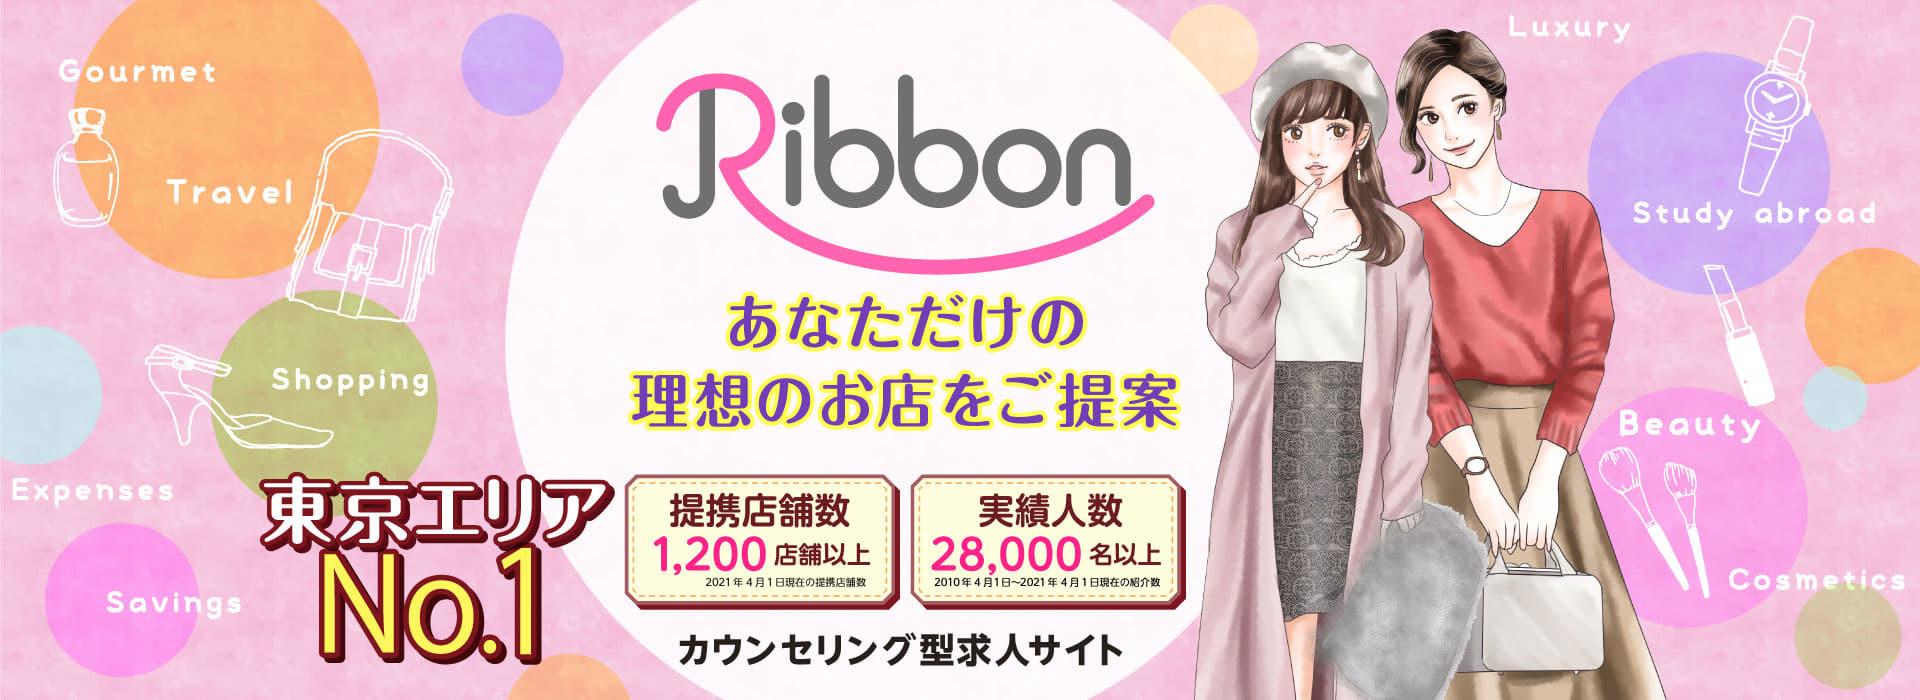 Ribbon カウンセリング型求人サイト